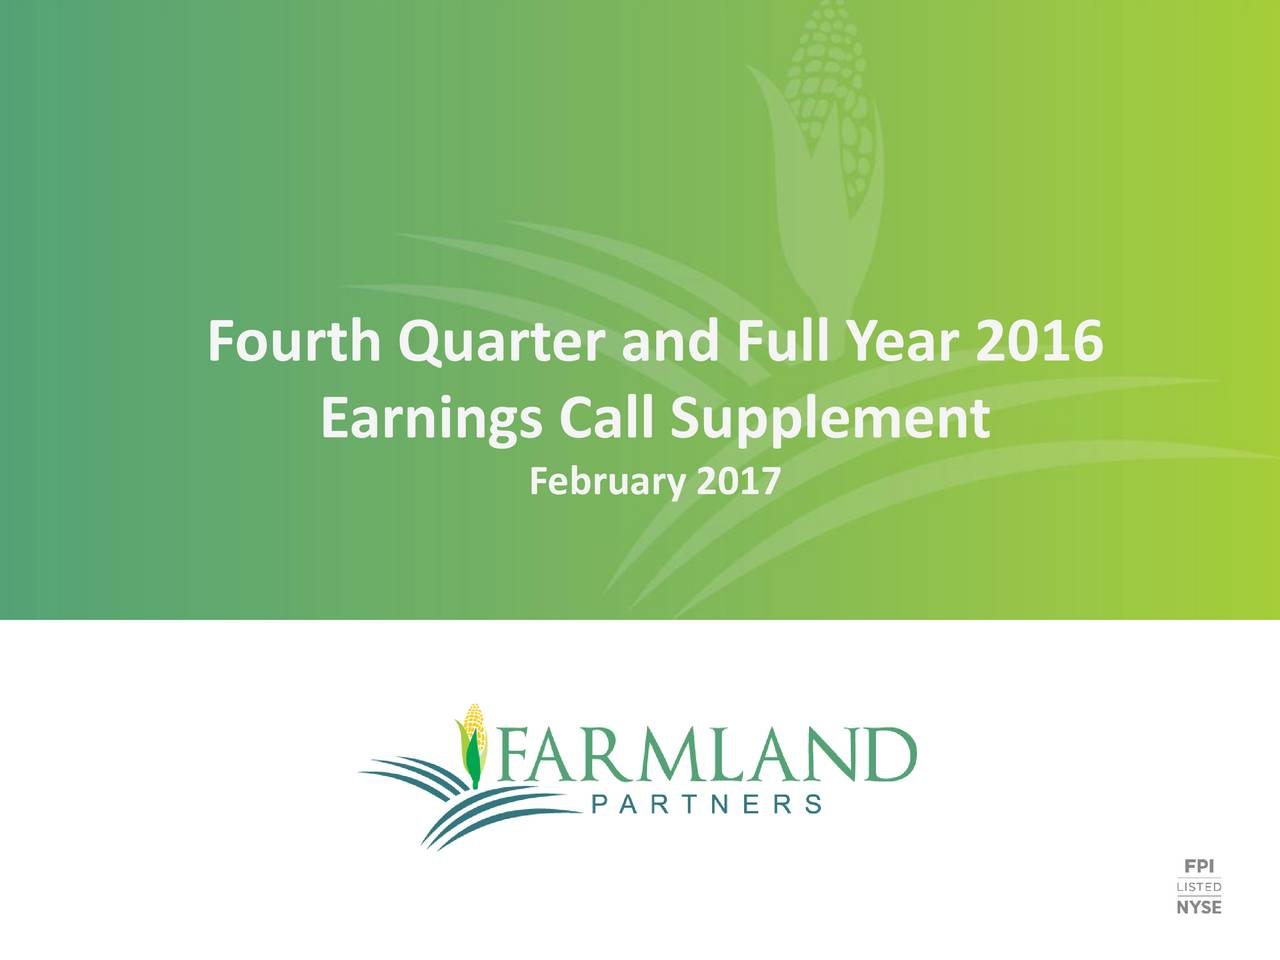 Earnings Call Supplement February 2017